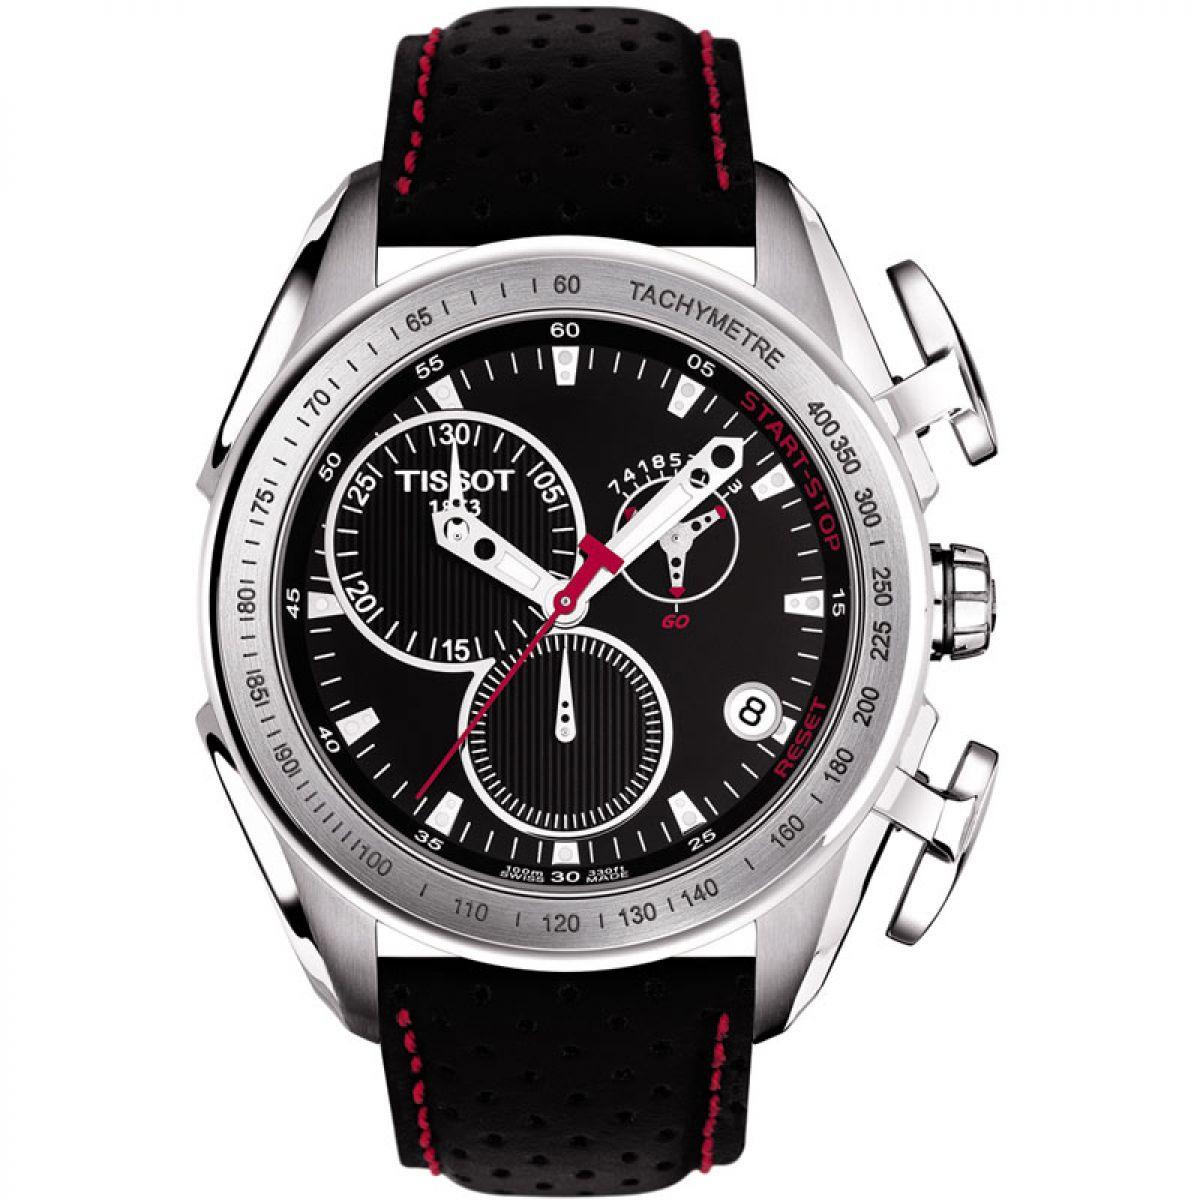 gents tissot t sport racing chronograph watch. Black Bedroom Furniture Sets. Home Design Ideas